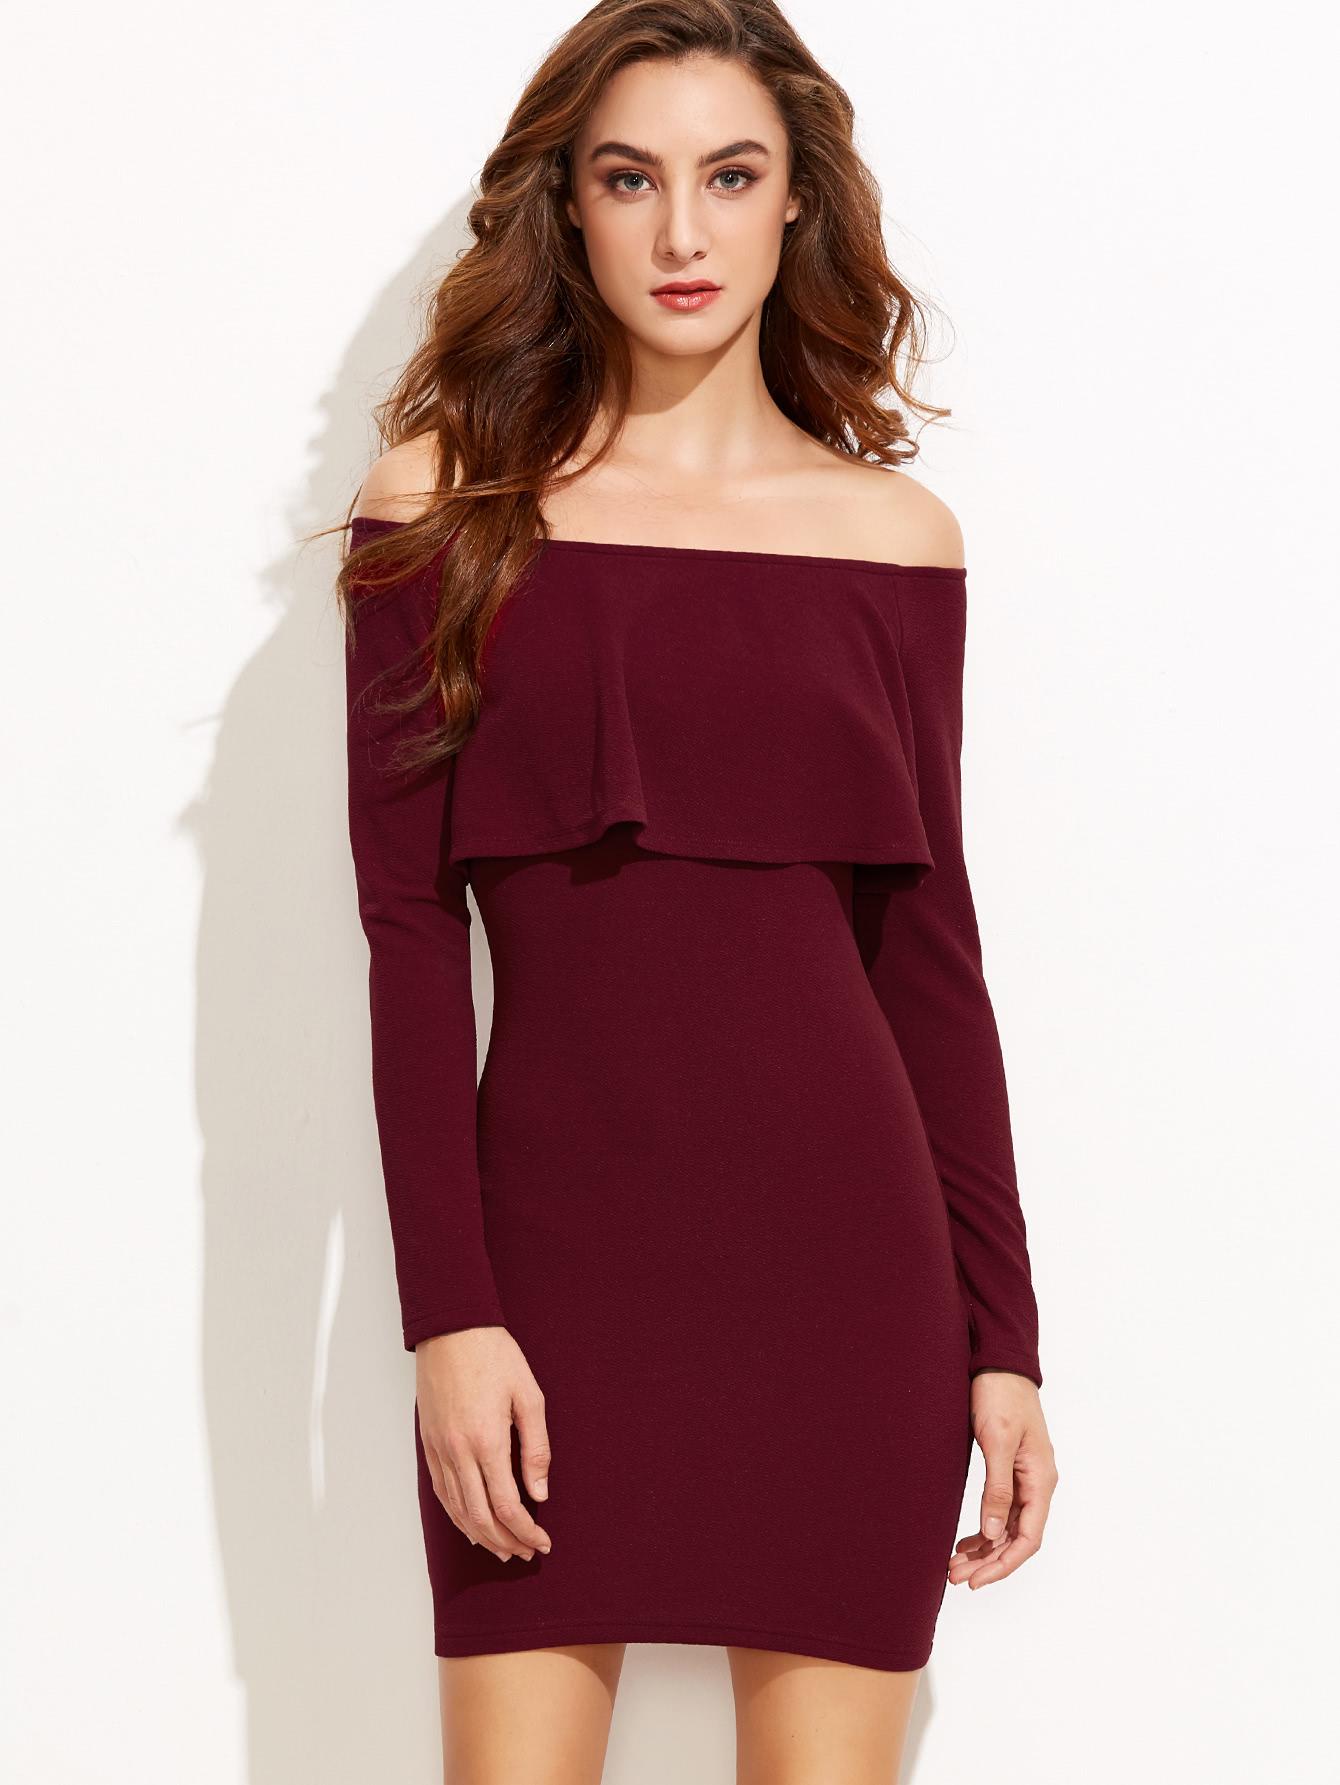 Burgundy off the shoulder bodycon dress neck